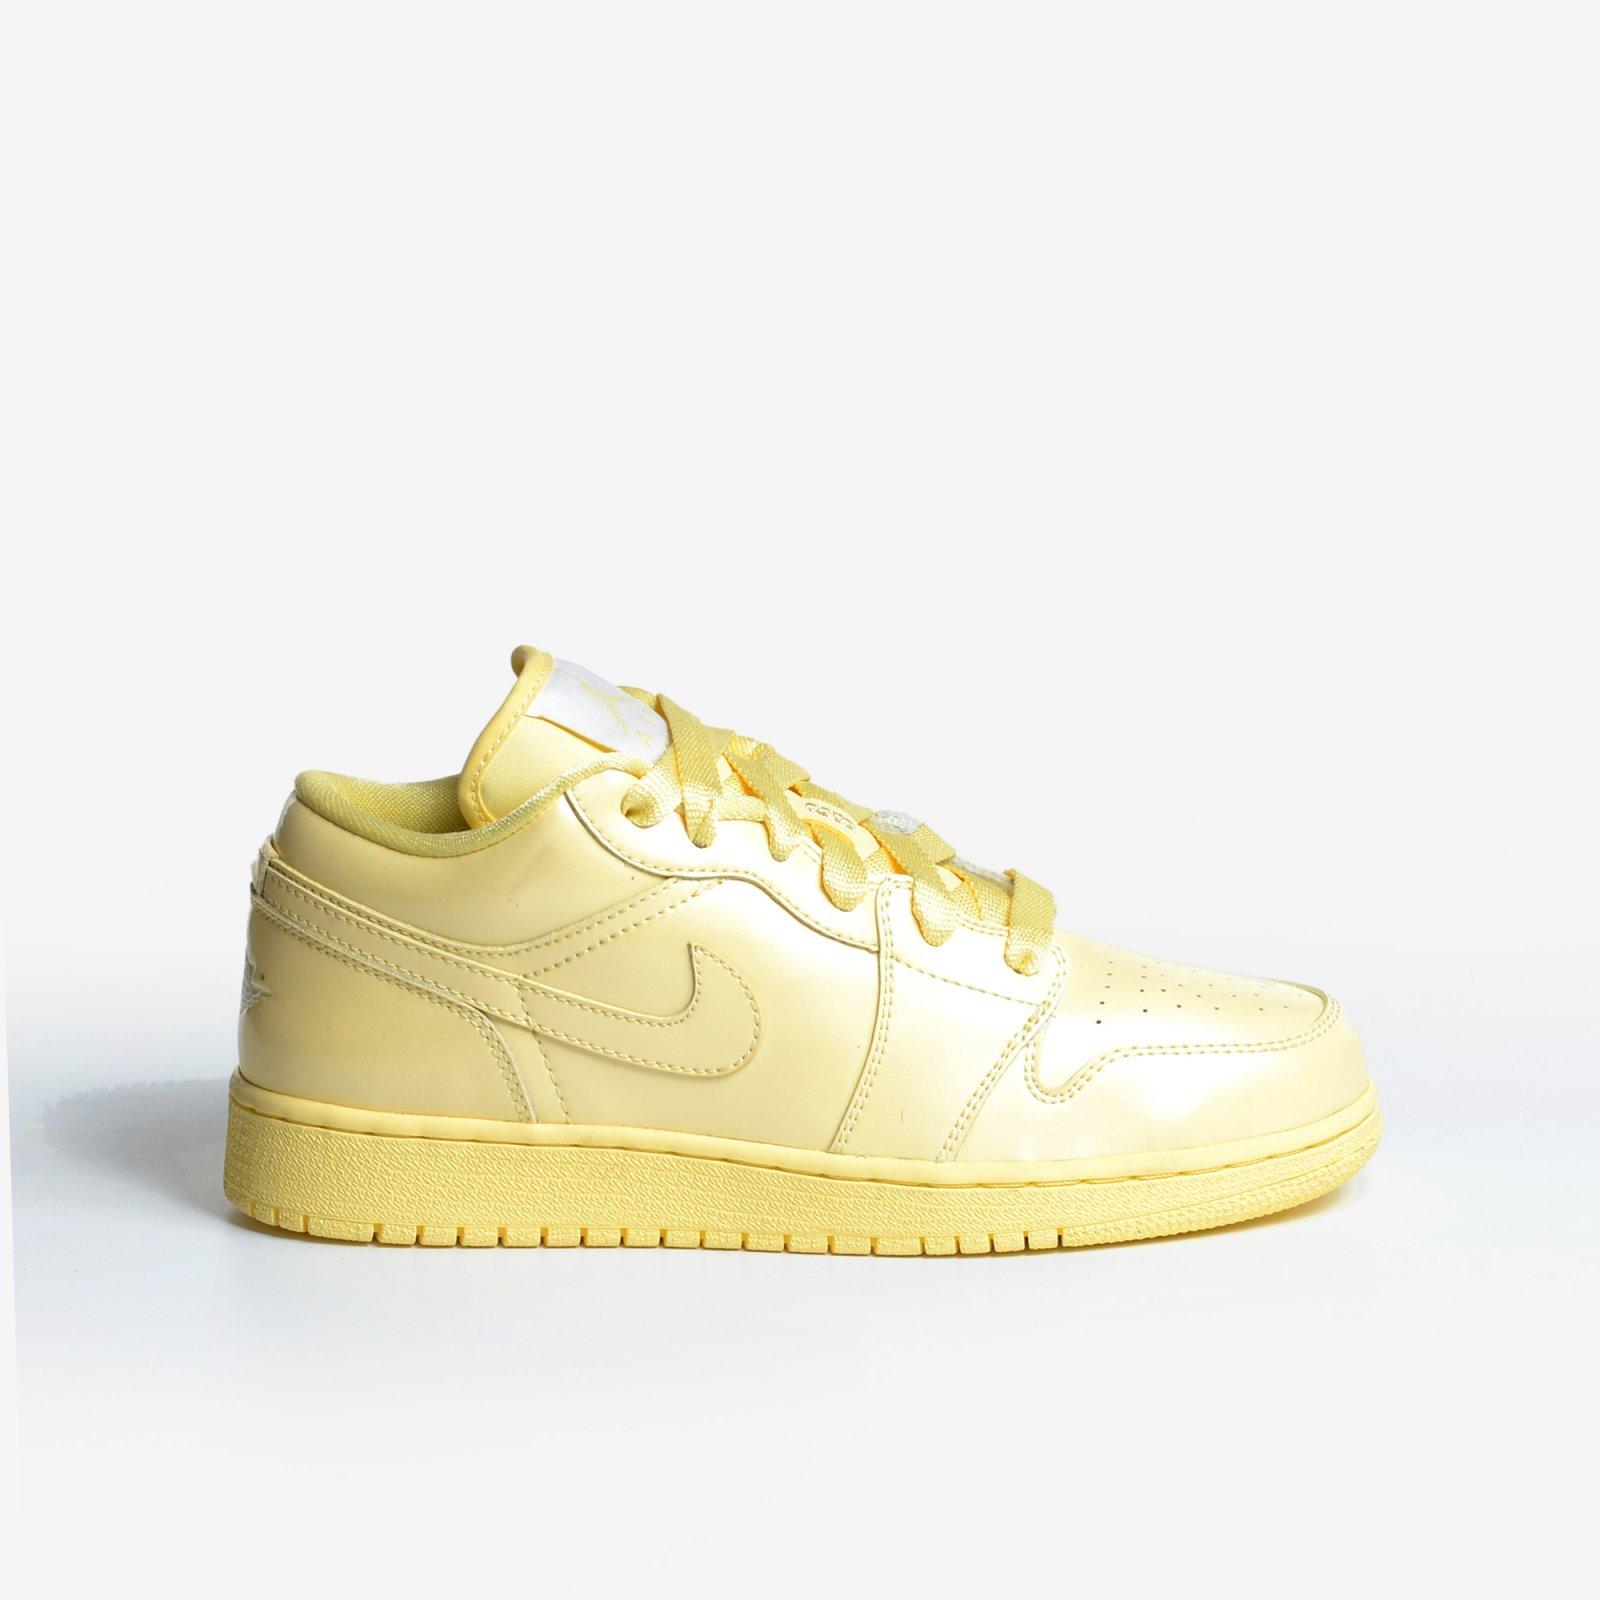 c428066b059 Girls Air Jordan 1 Phat Low Size 5.5Y Lemon Patent Retro GS Nike 352718-711